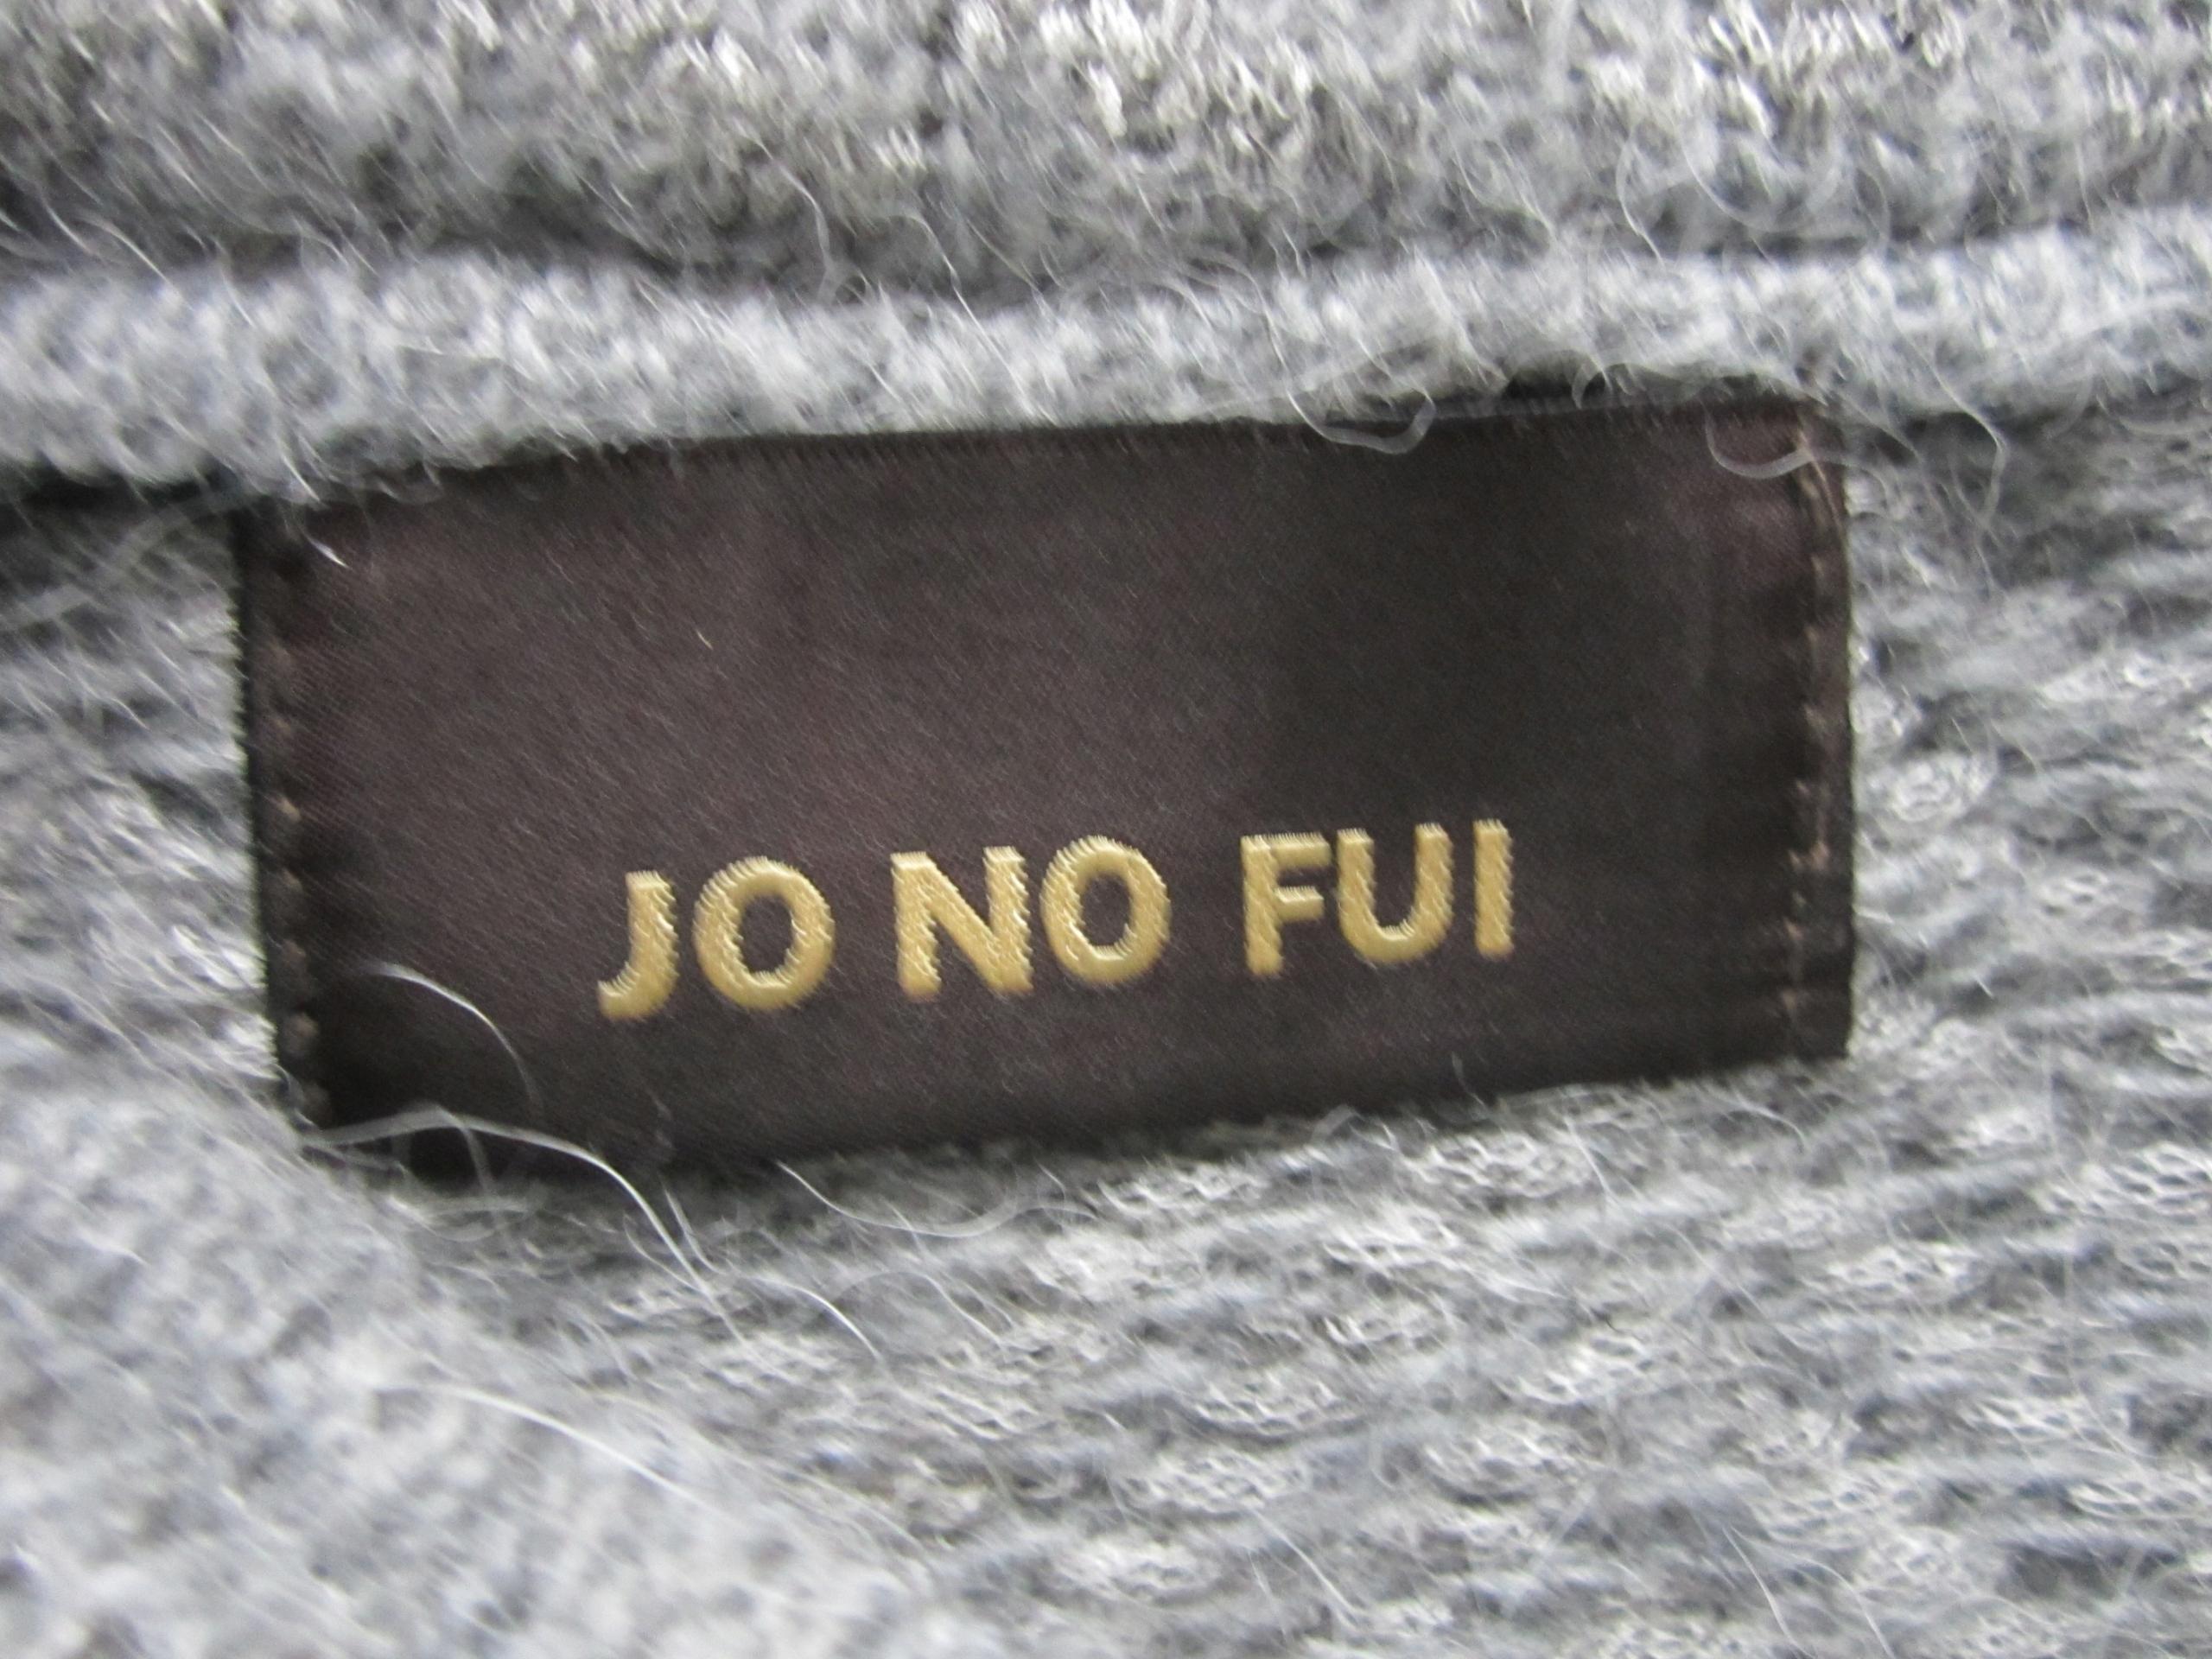 JO NO FUI_Oversize_Casual Woman Edition